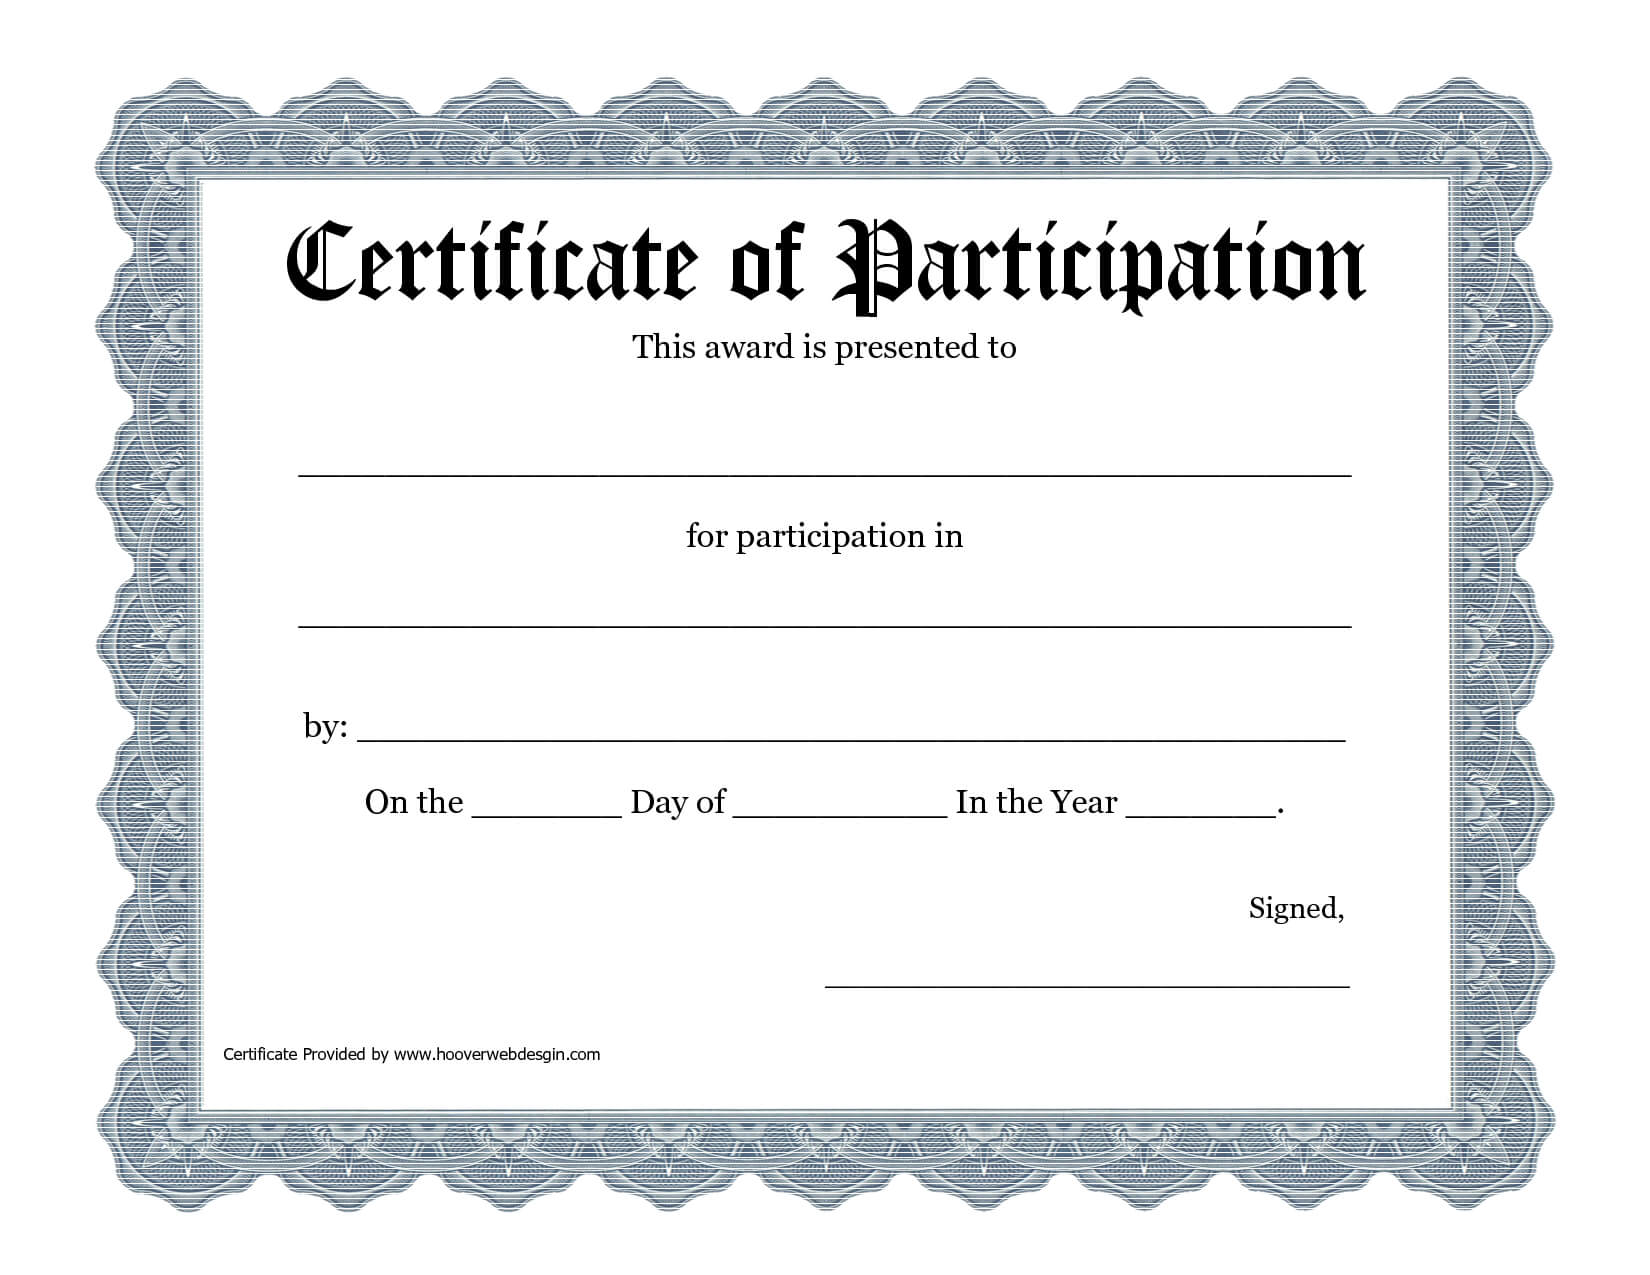 Free Printable Award Certificate Template - Bing Images within Free Printable Funny Certificate Templates